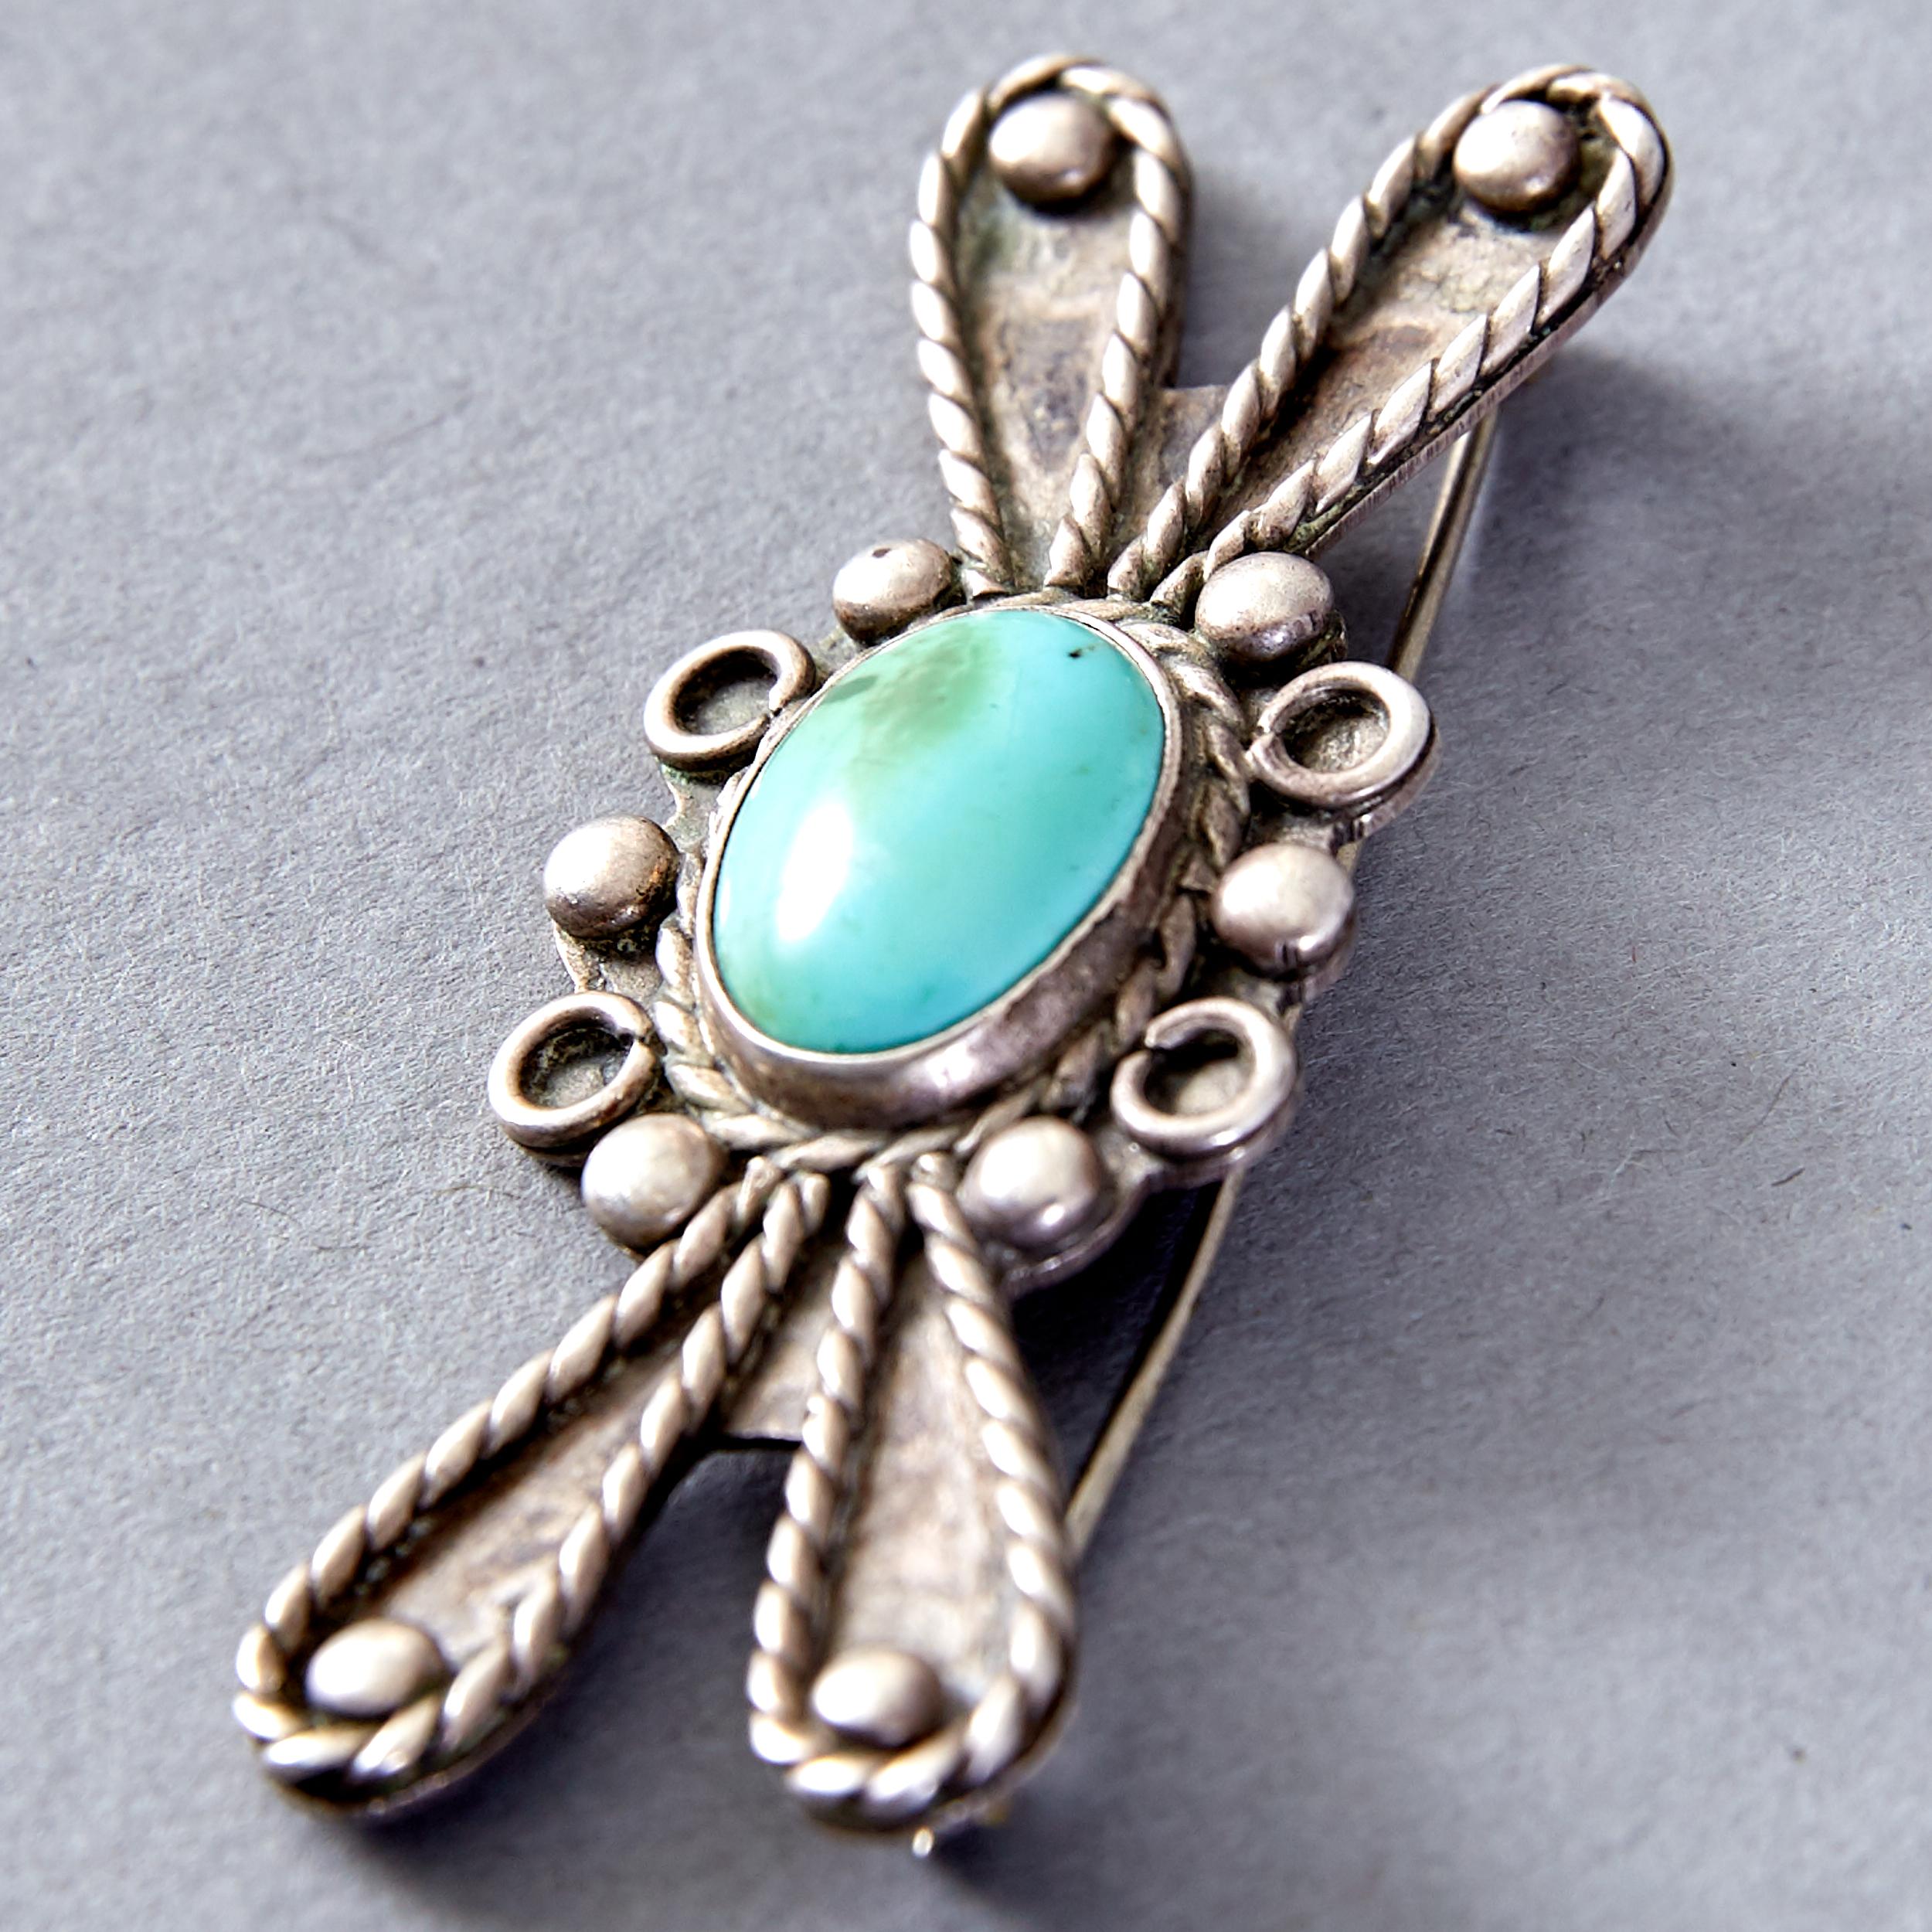 Lot 325 - 5 Native American Navajo & Plains Silver Pins and Pendants